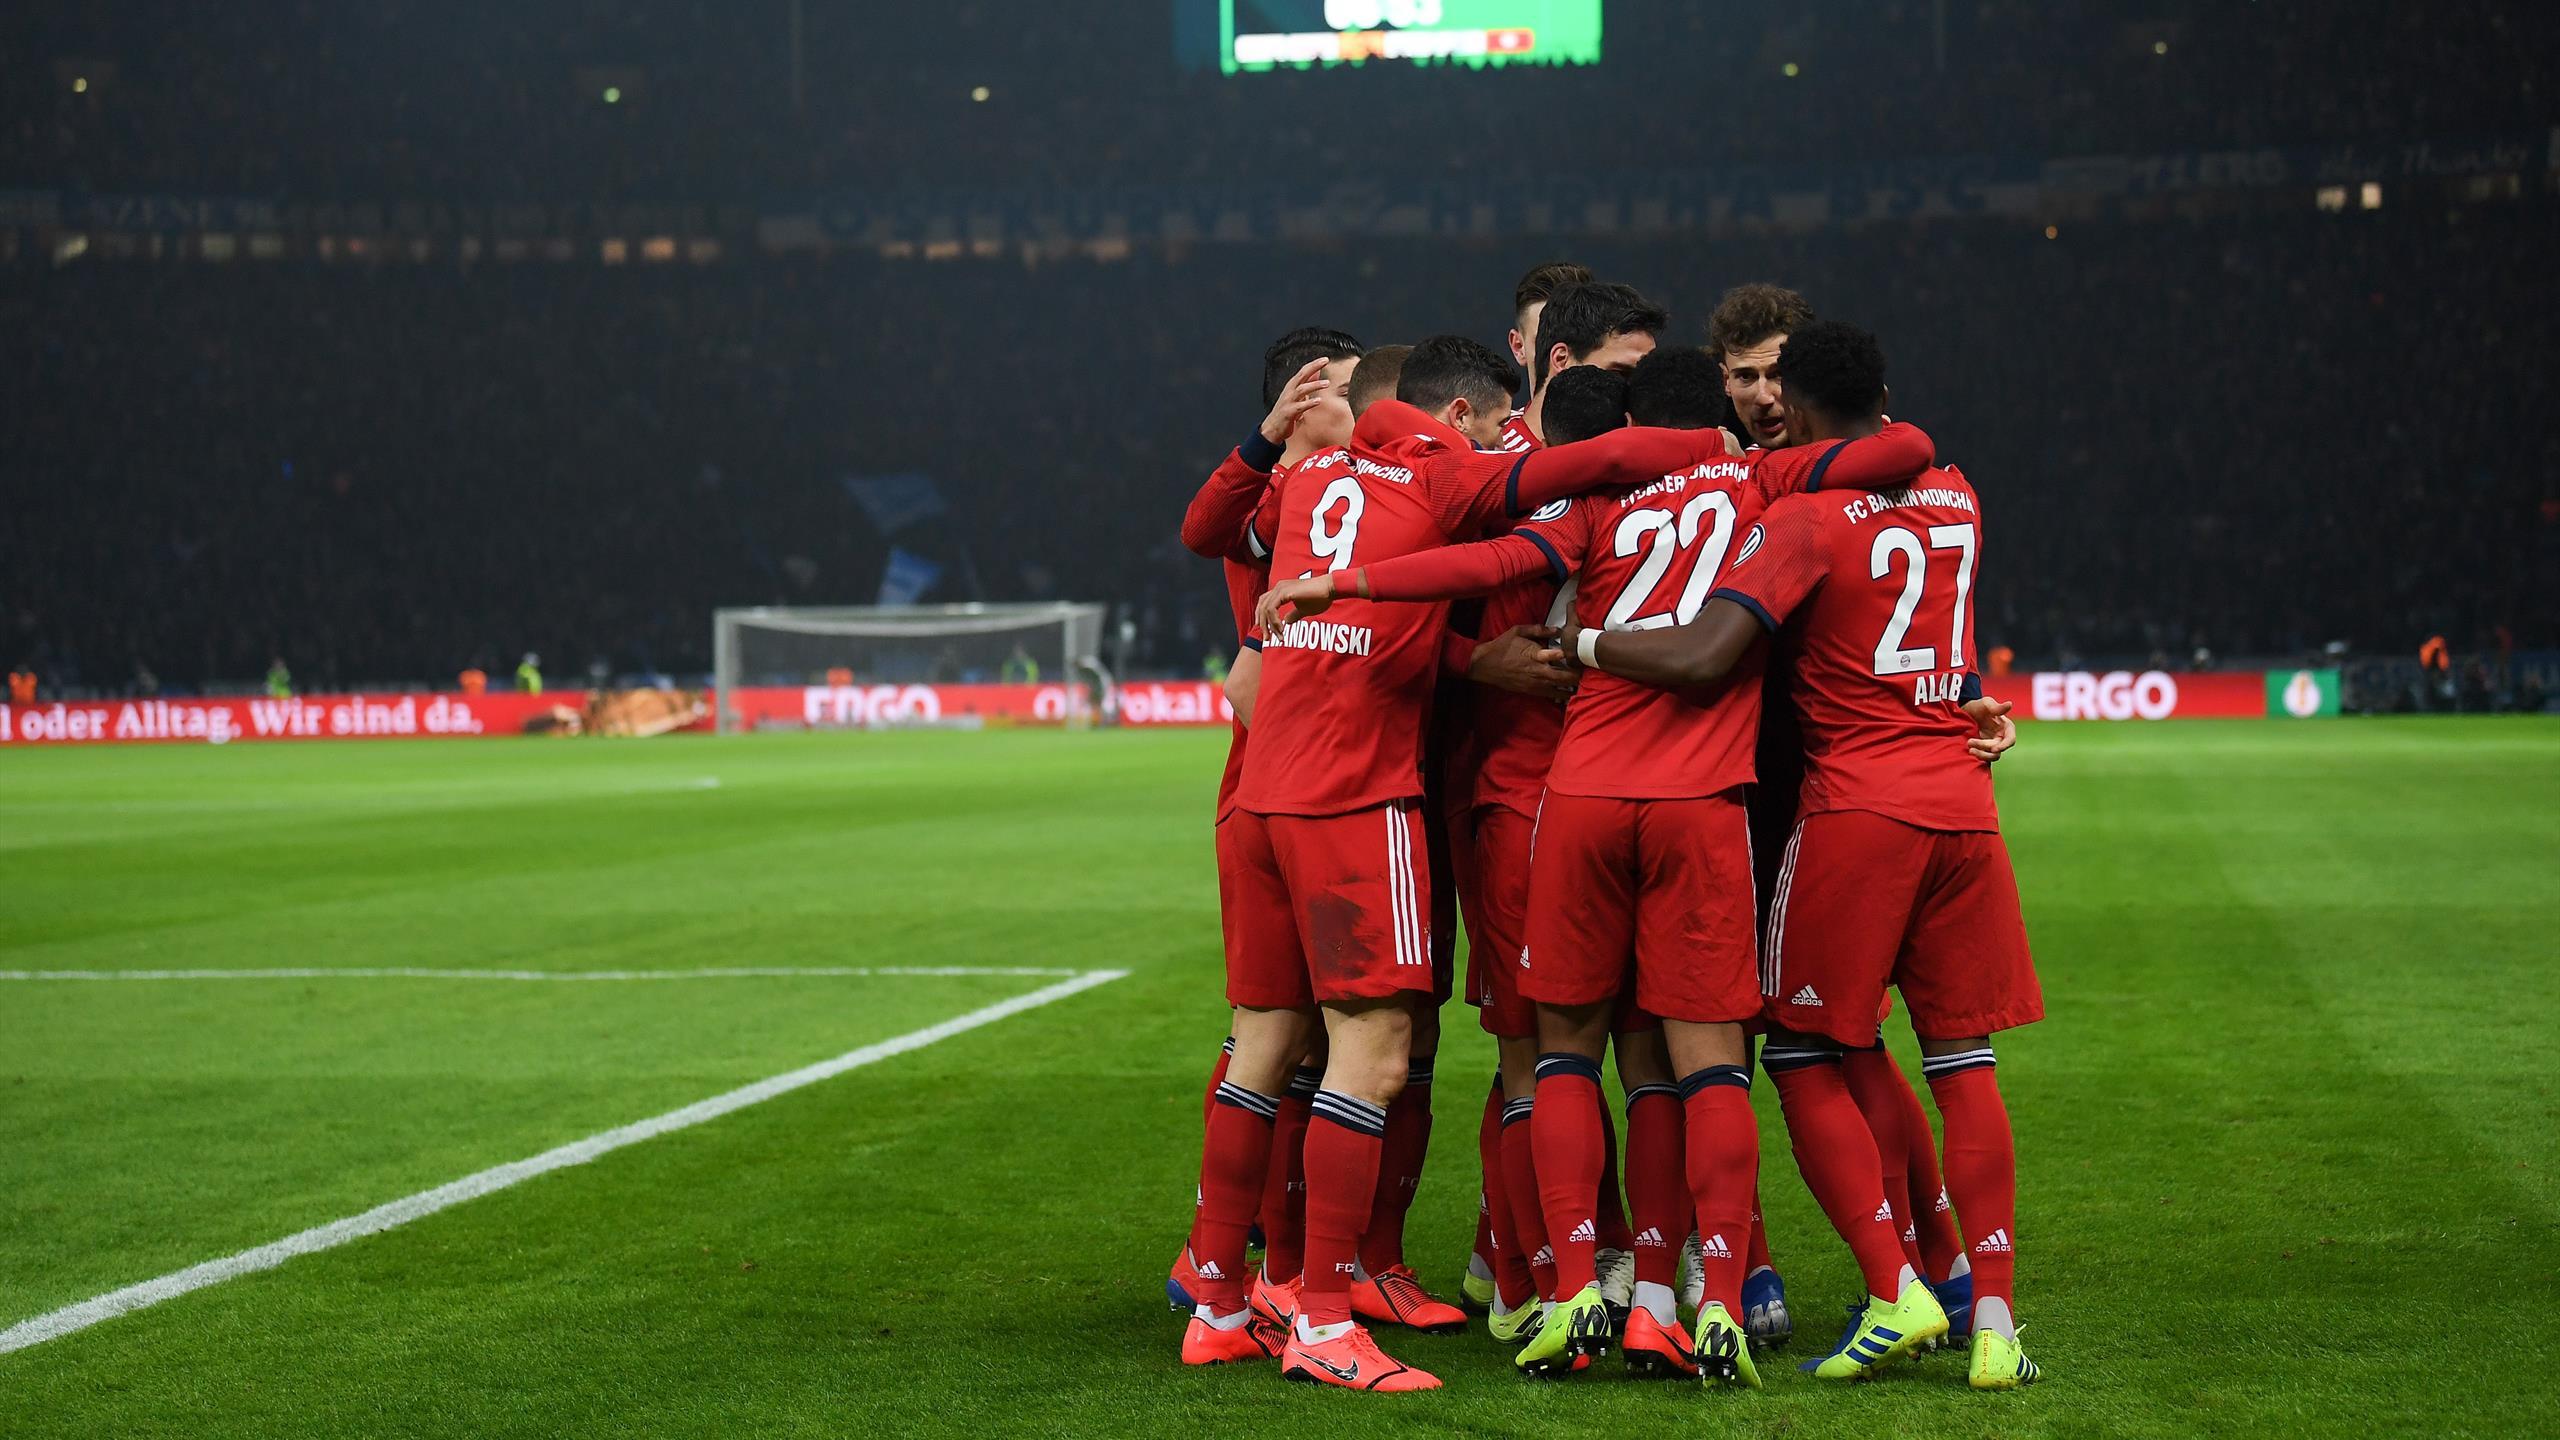 Футбол кубок германии прямая трансляция бавария дармштадт